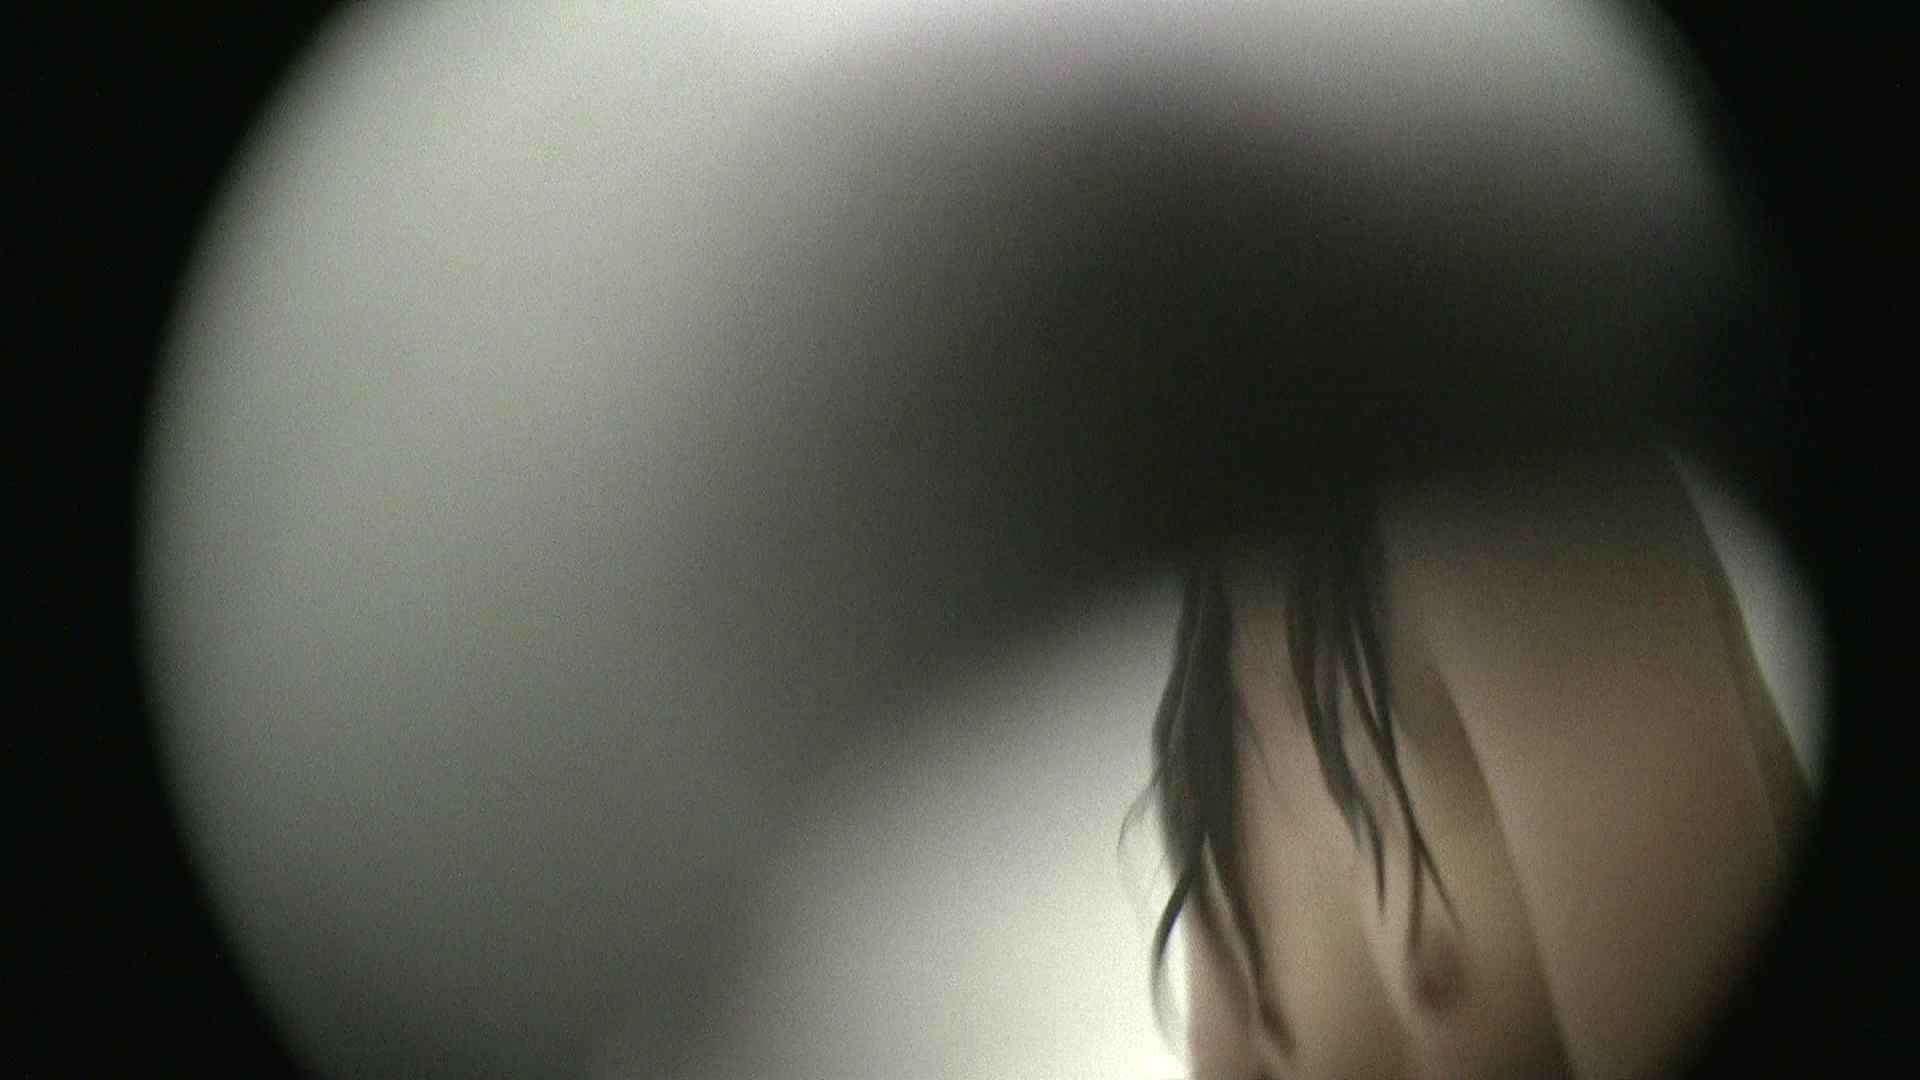 NO.22 何をニヤニヤしているのやら【MKB10位】 シャワー室 オマンコ無修正動画無料 71画像 38